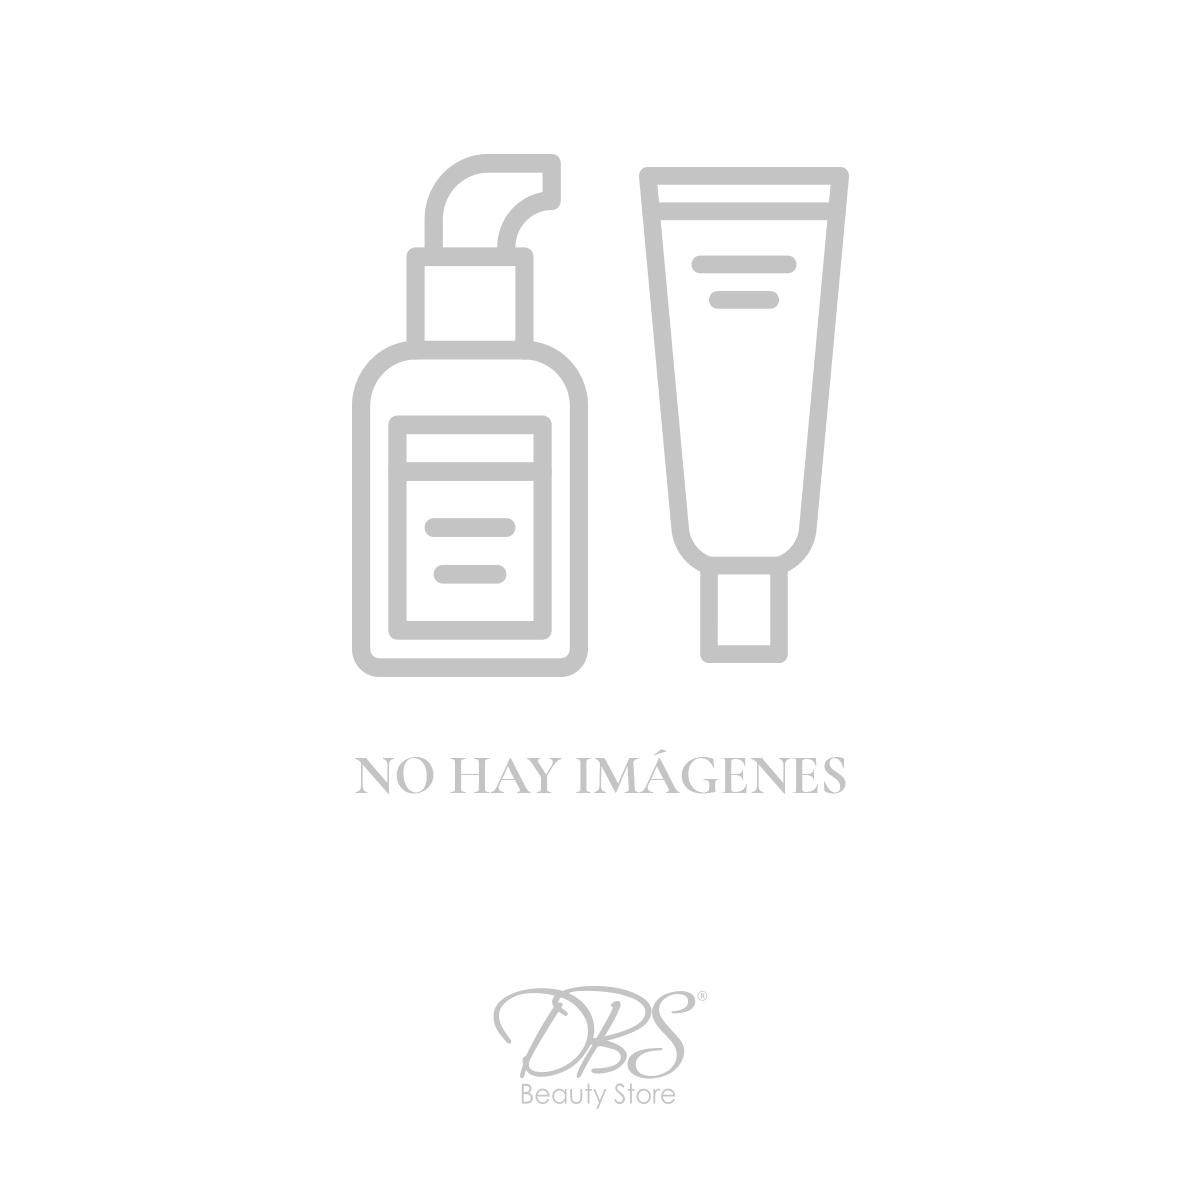 Shampoo Suave Perfecto 250 Ml